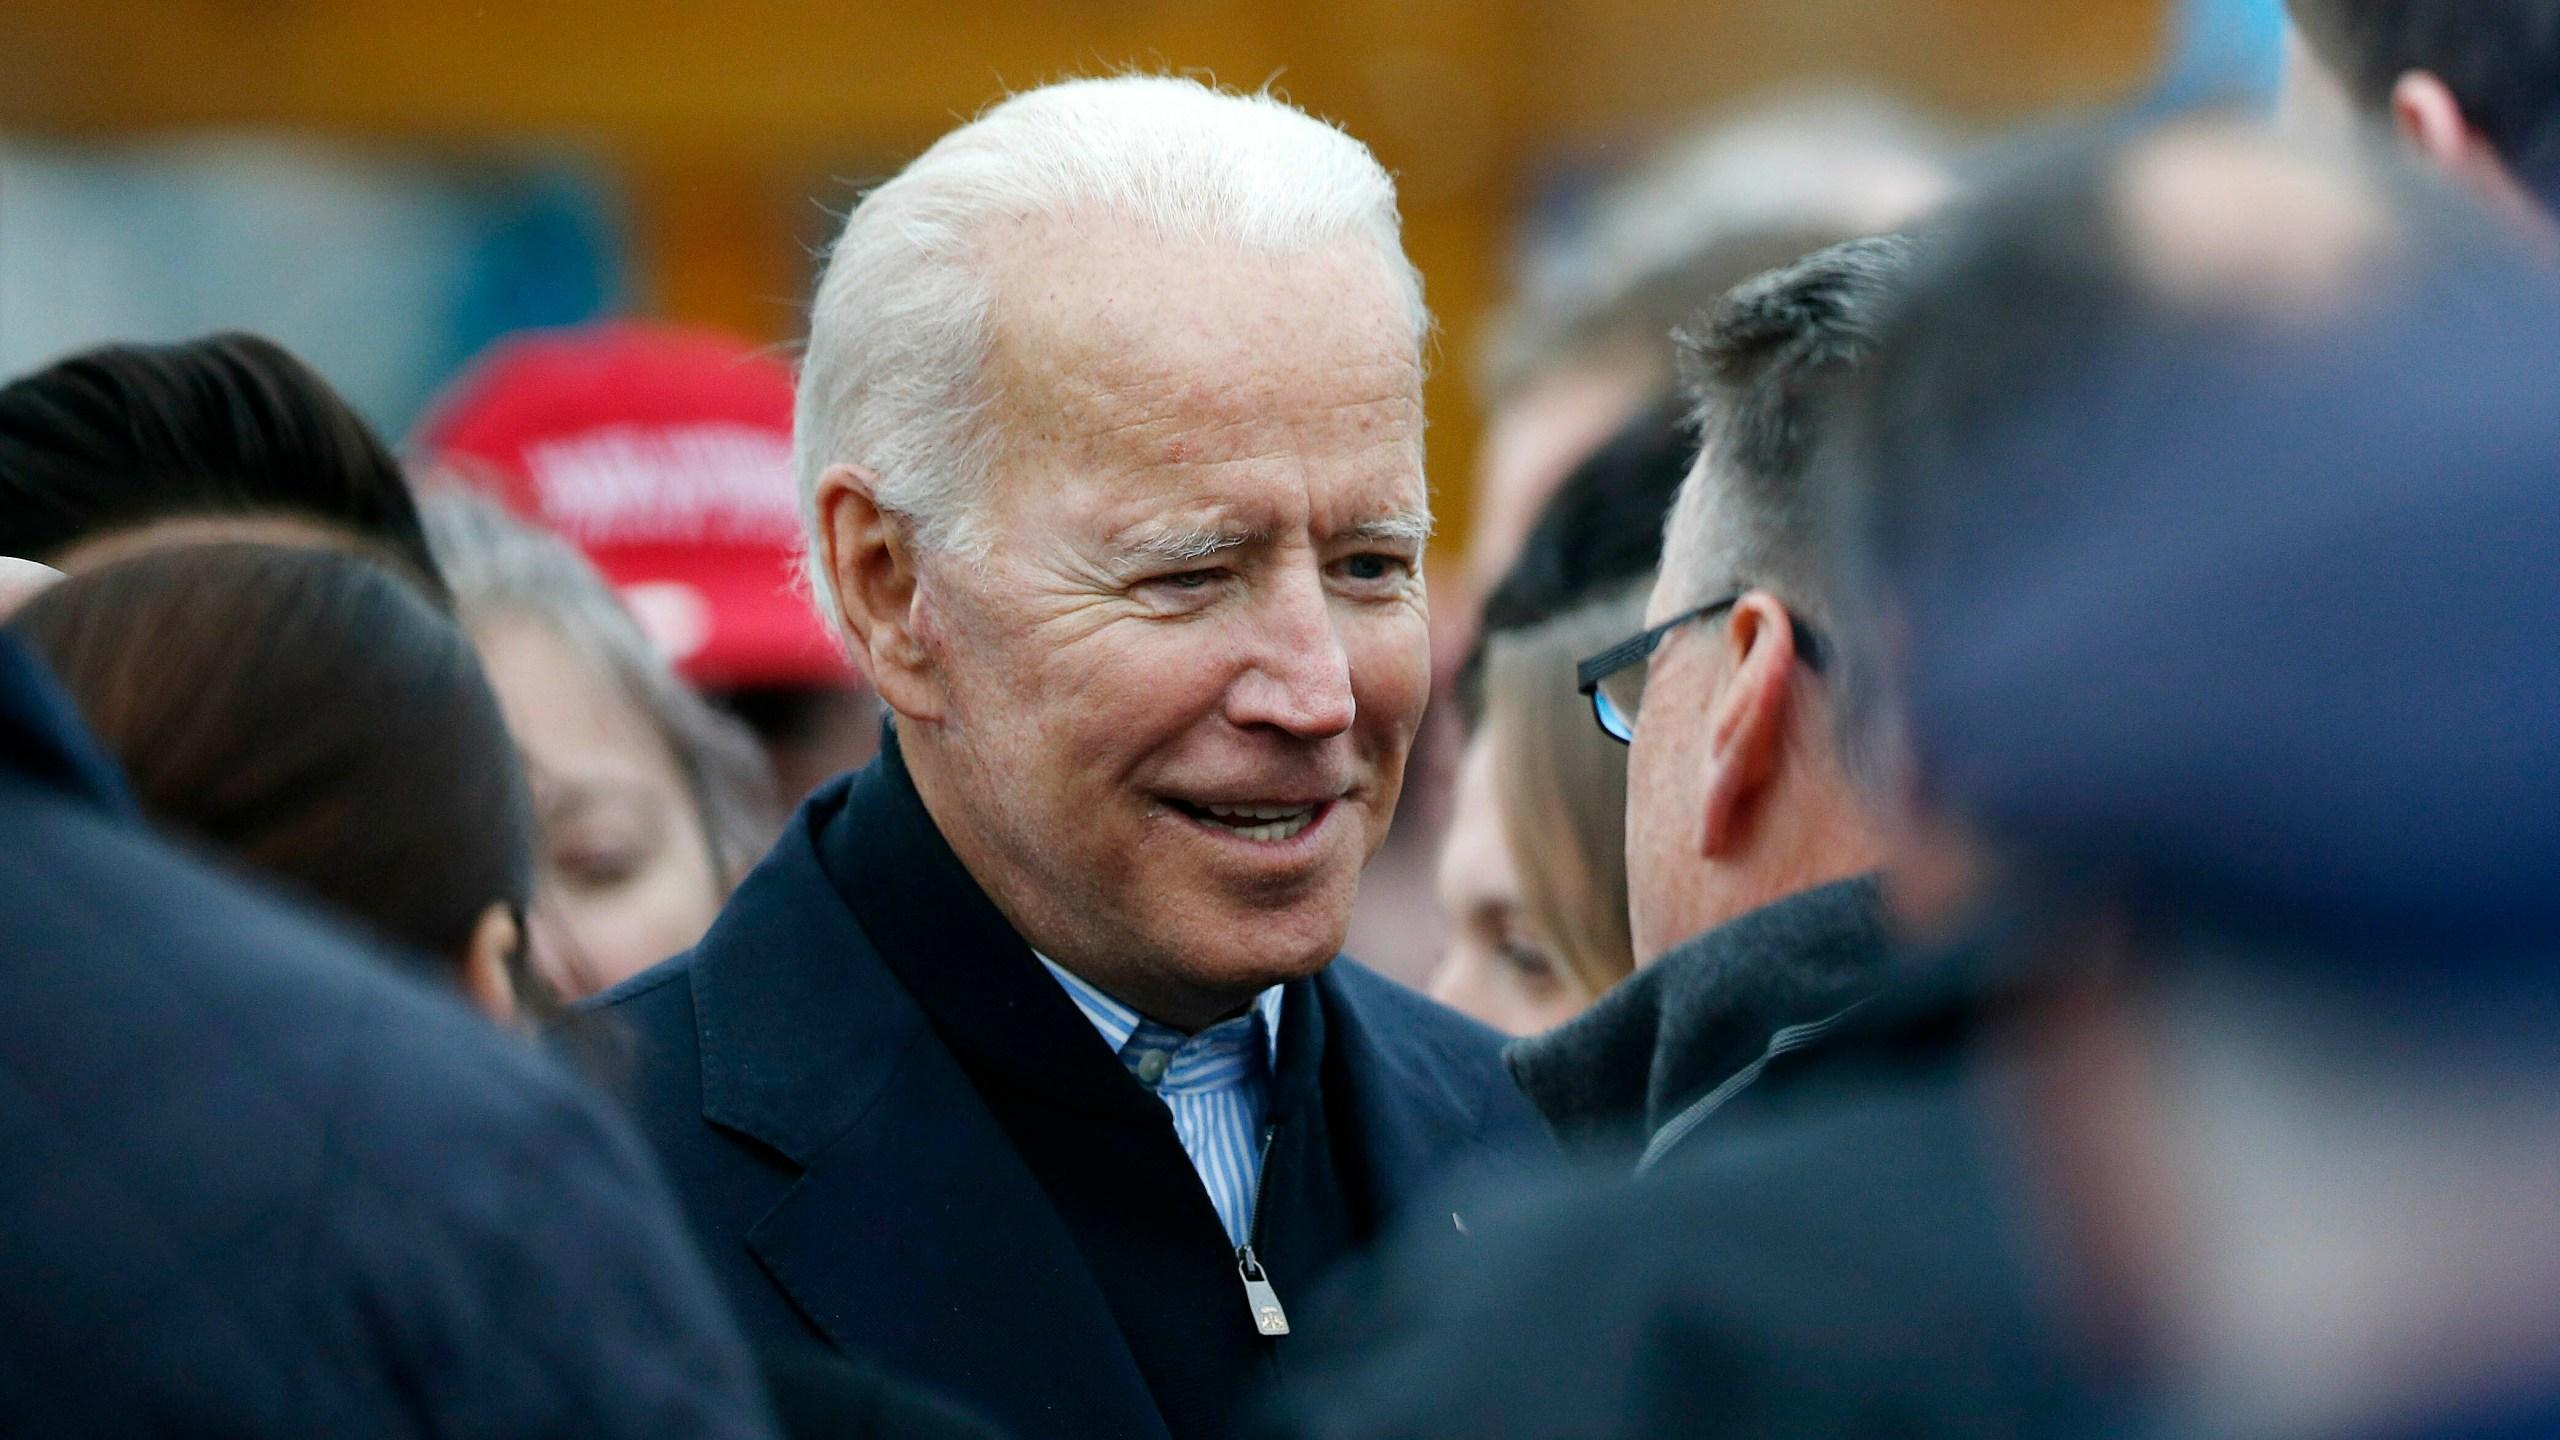 Election 2020 Joe Biden_1555690278756